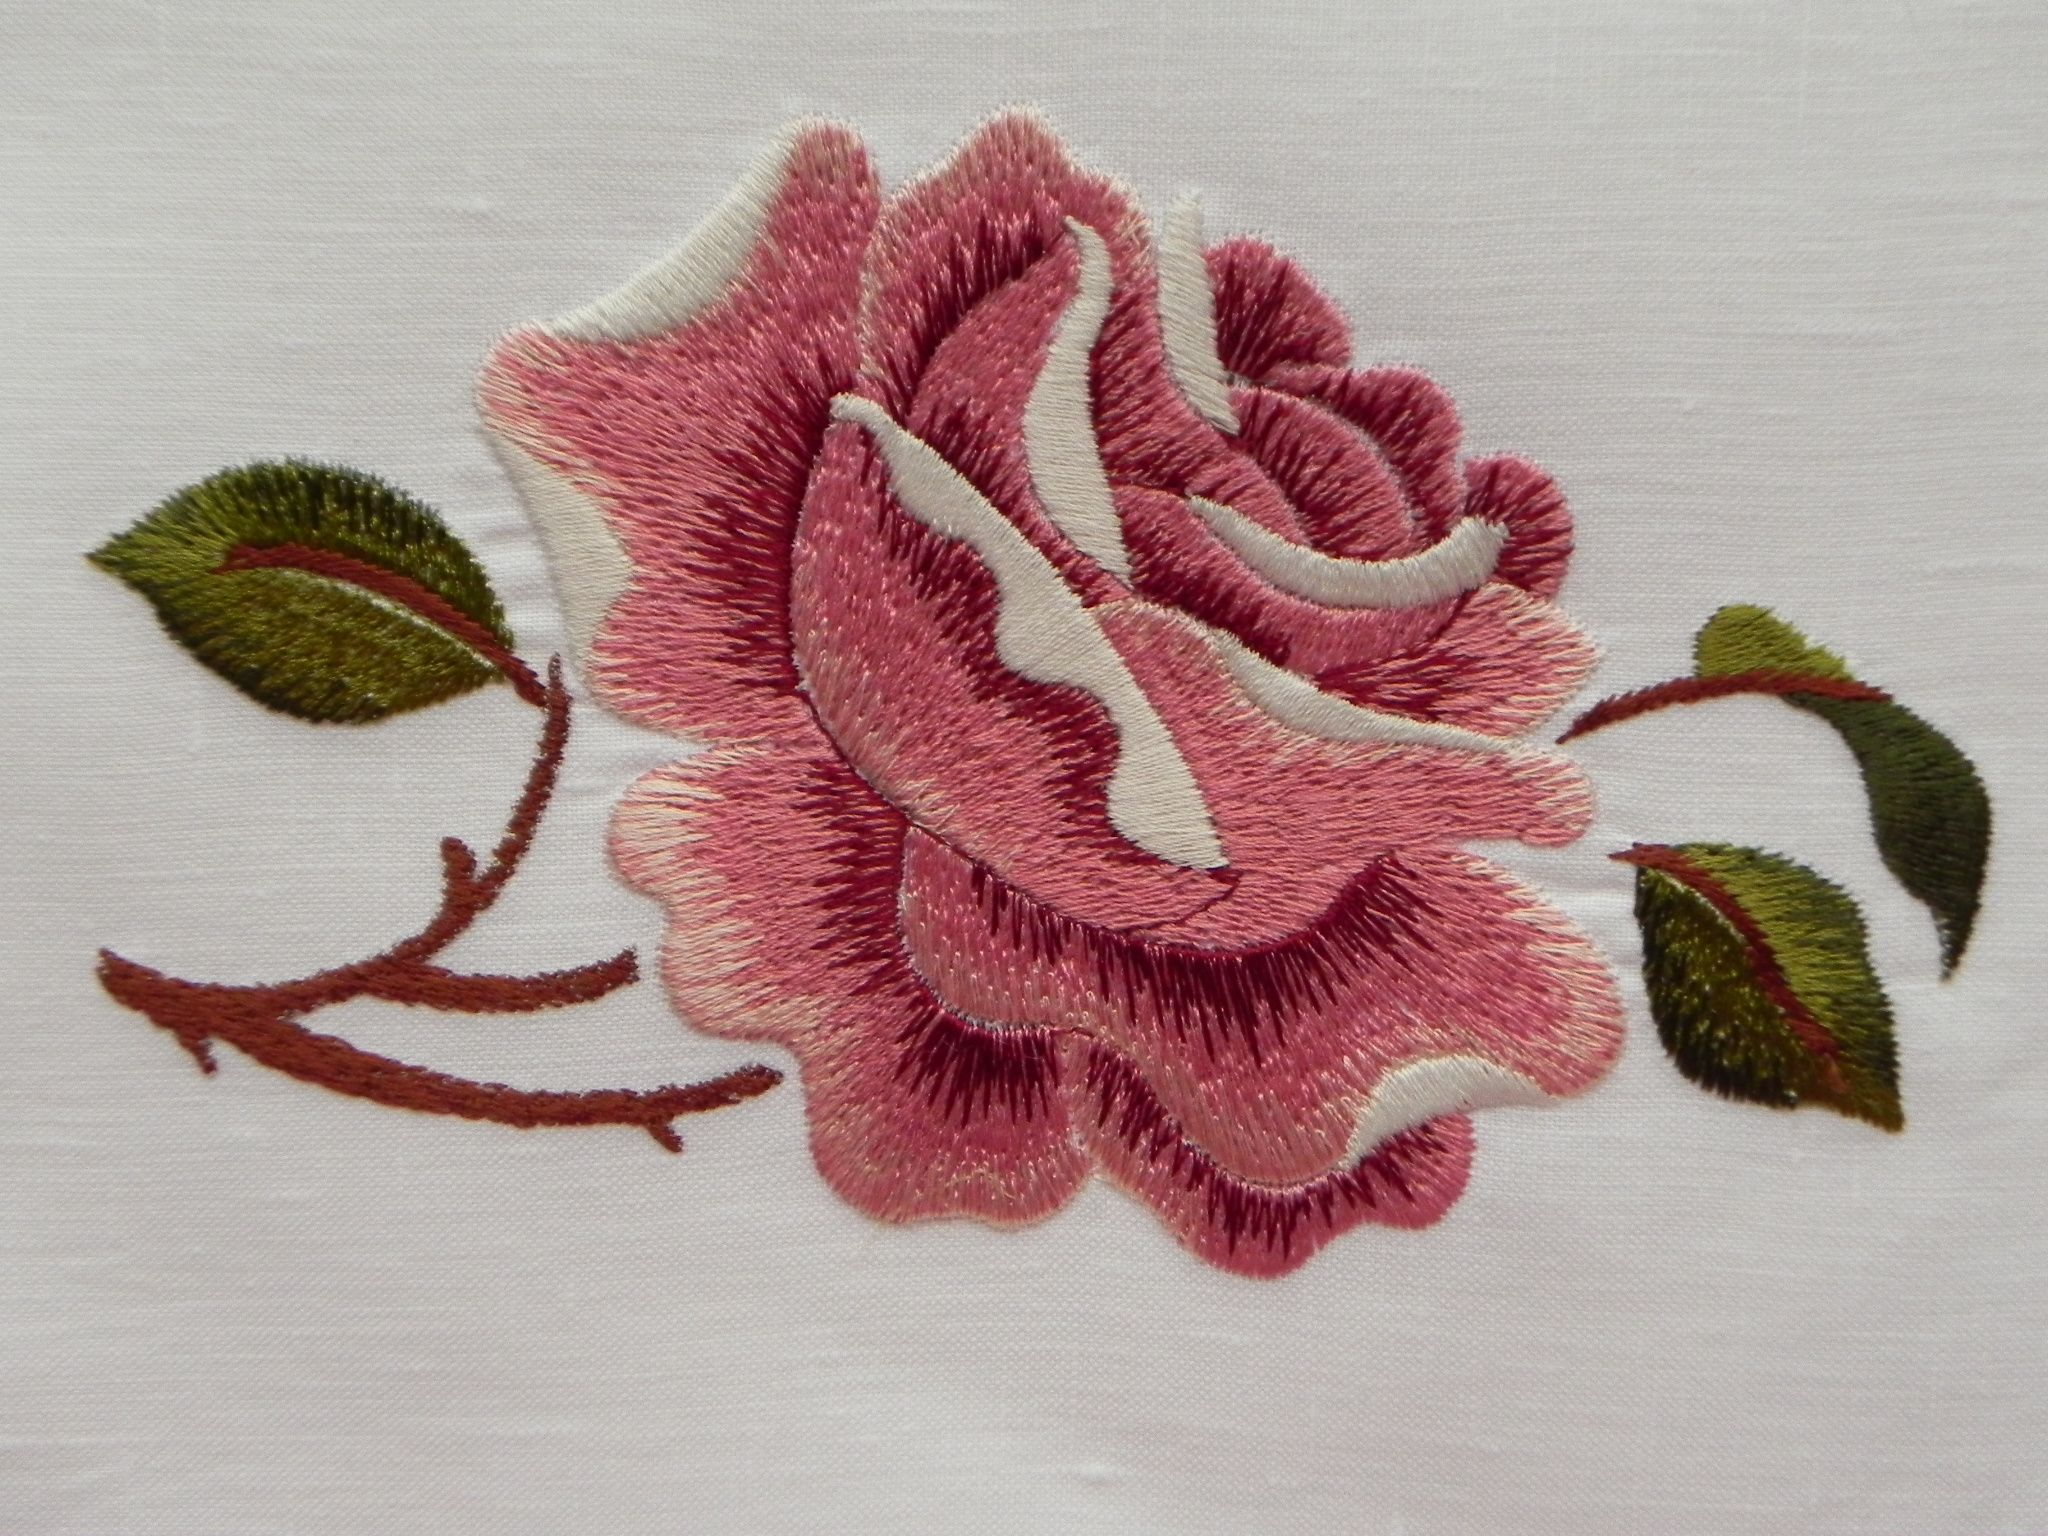 Machine embroidery satin stitch rose